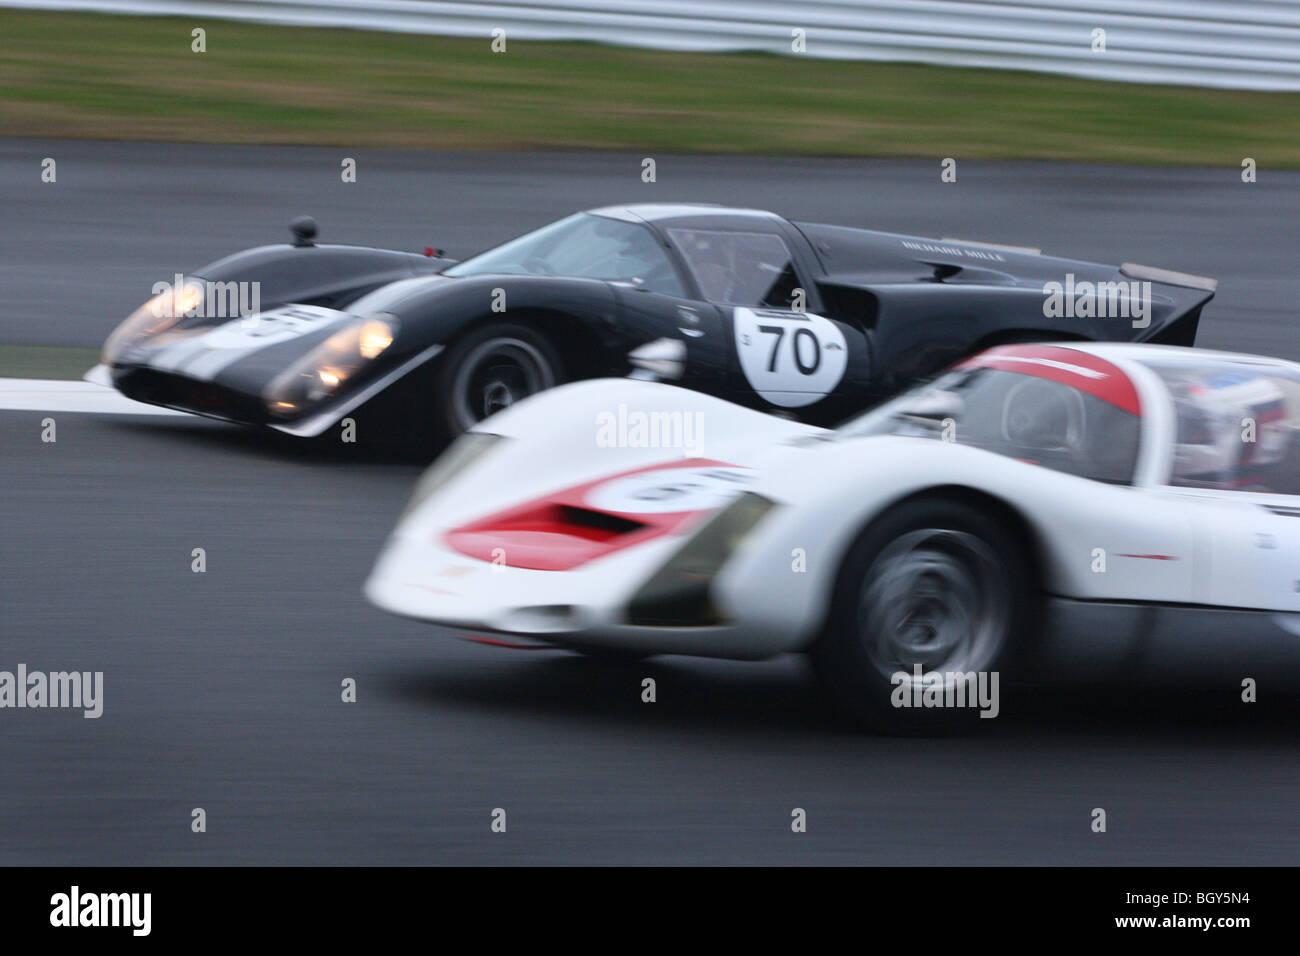 Lola Mkiii B And Porsche Carrera Le Mans Classic